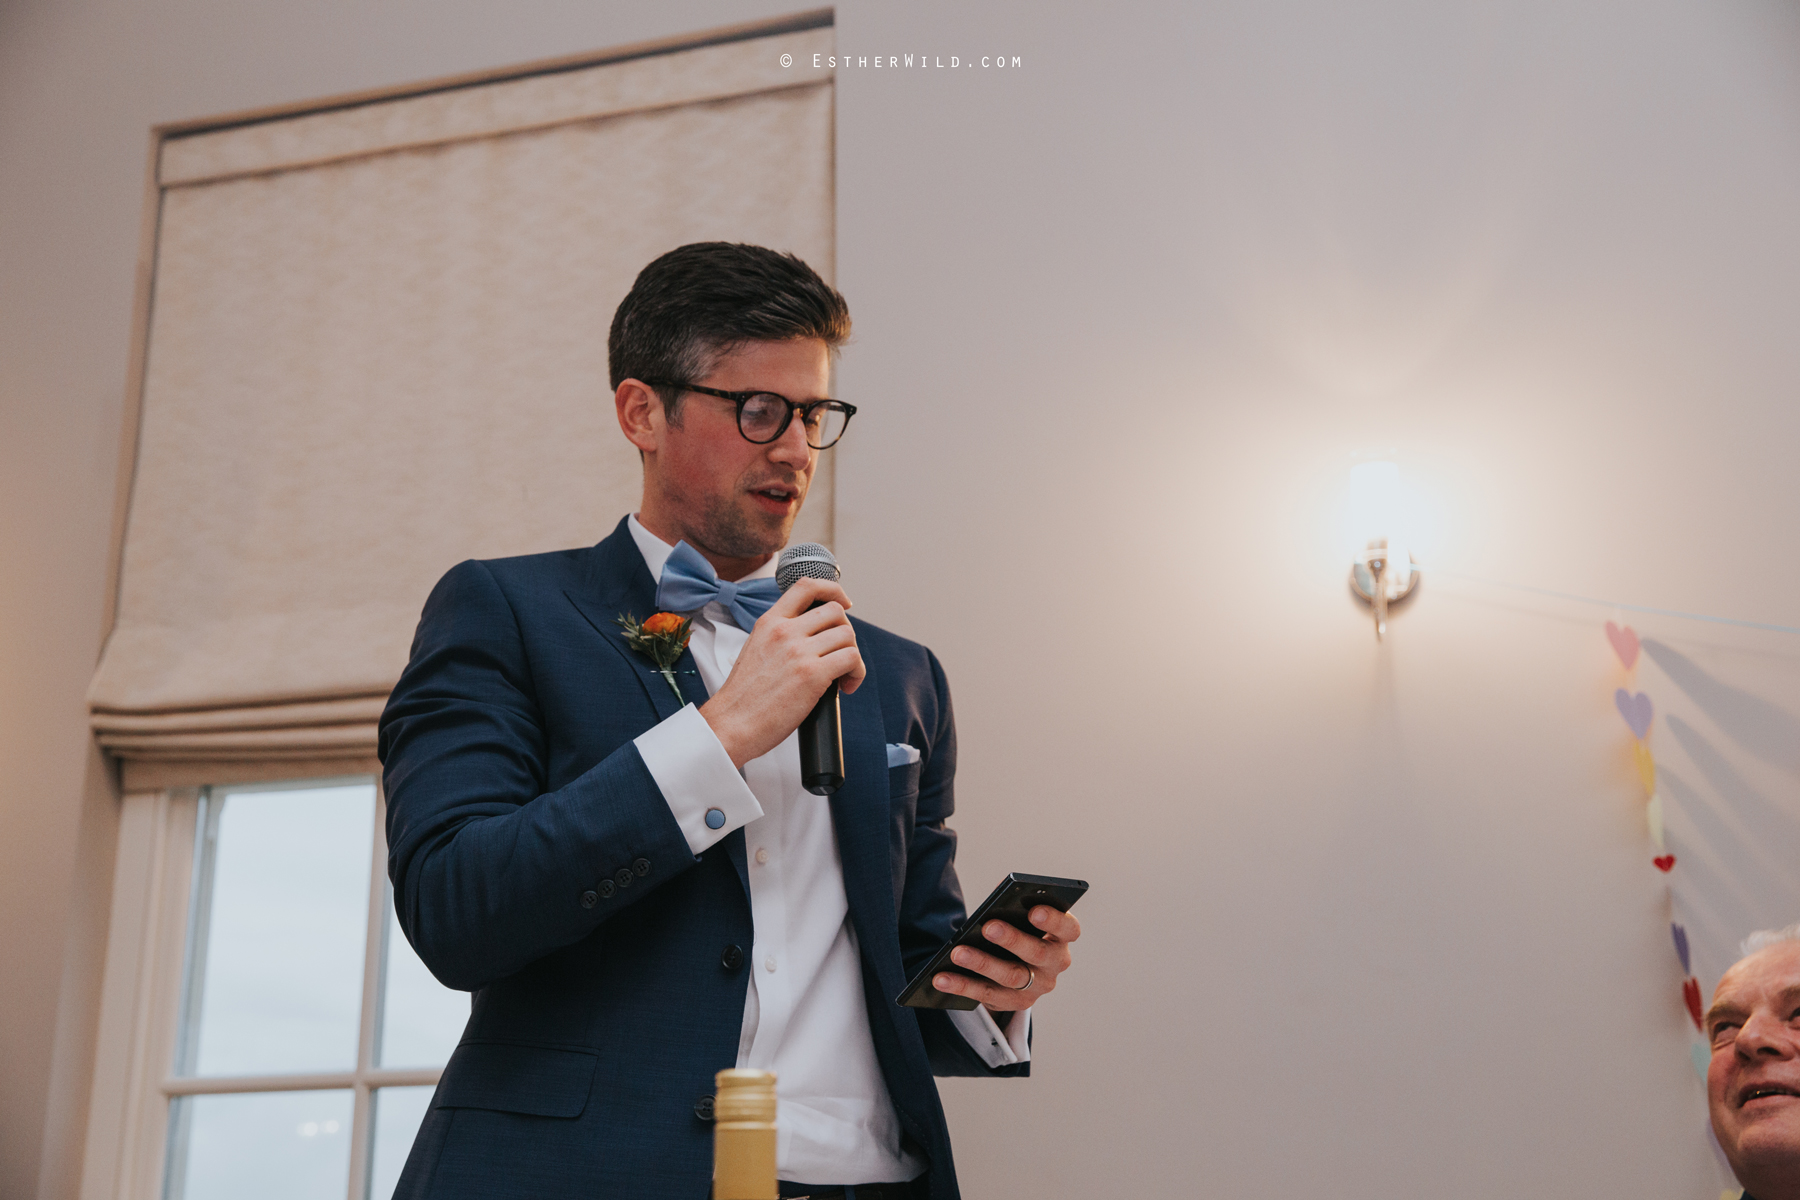 The_BoatHouse_Wedding_Venue_Ormesby_Norfolk_Broads_Boat_Wedding_Photography_Esther_Wild_Photographer_IMG_3173.jpg